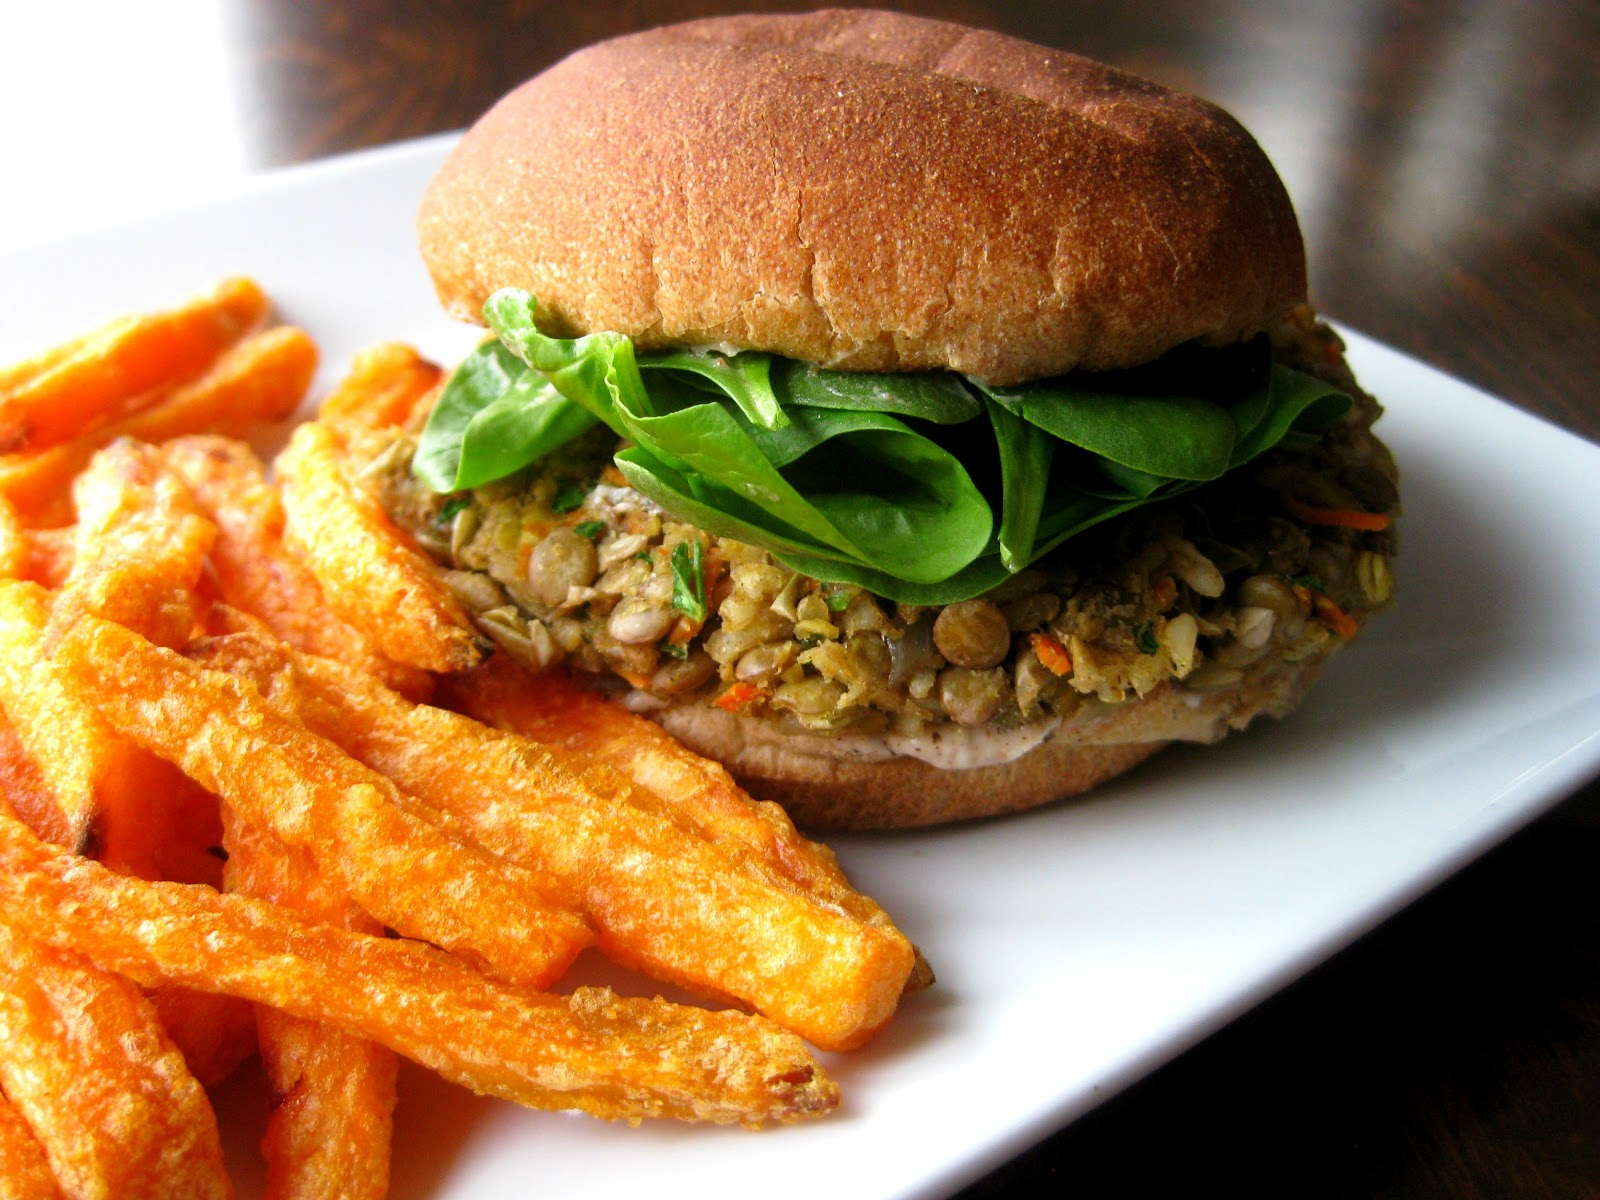 Healthy Cooking for Teens: Veggie Burger & Sweet Potato Fries